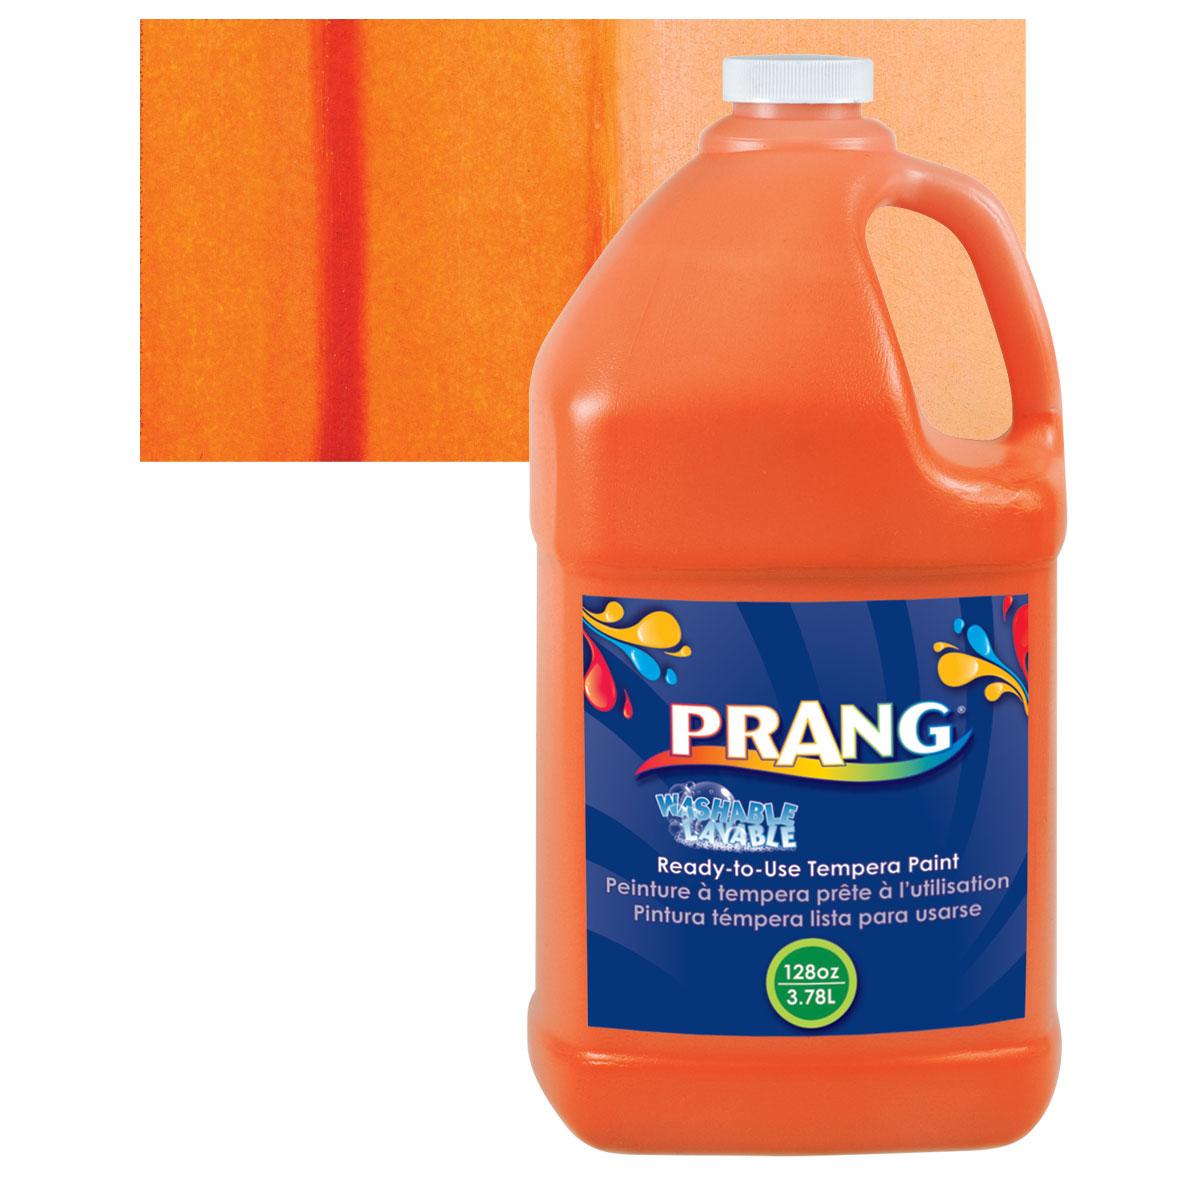 Prang Ready-To-Use Washable Tempera Paint - Orange, Gallon